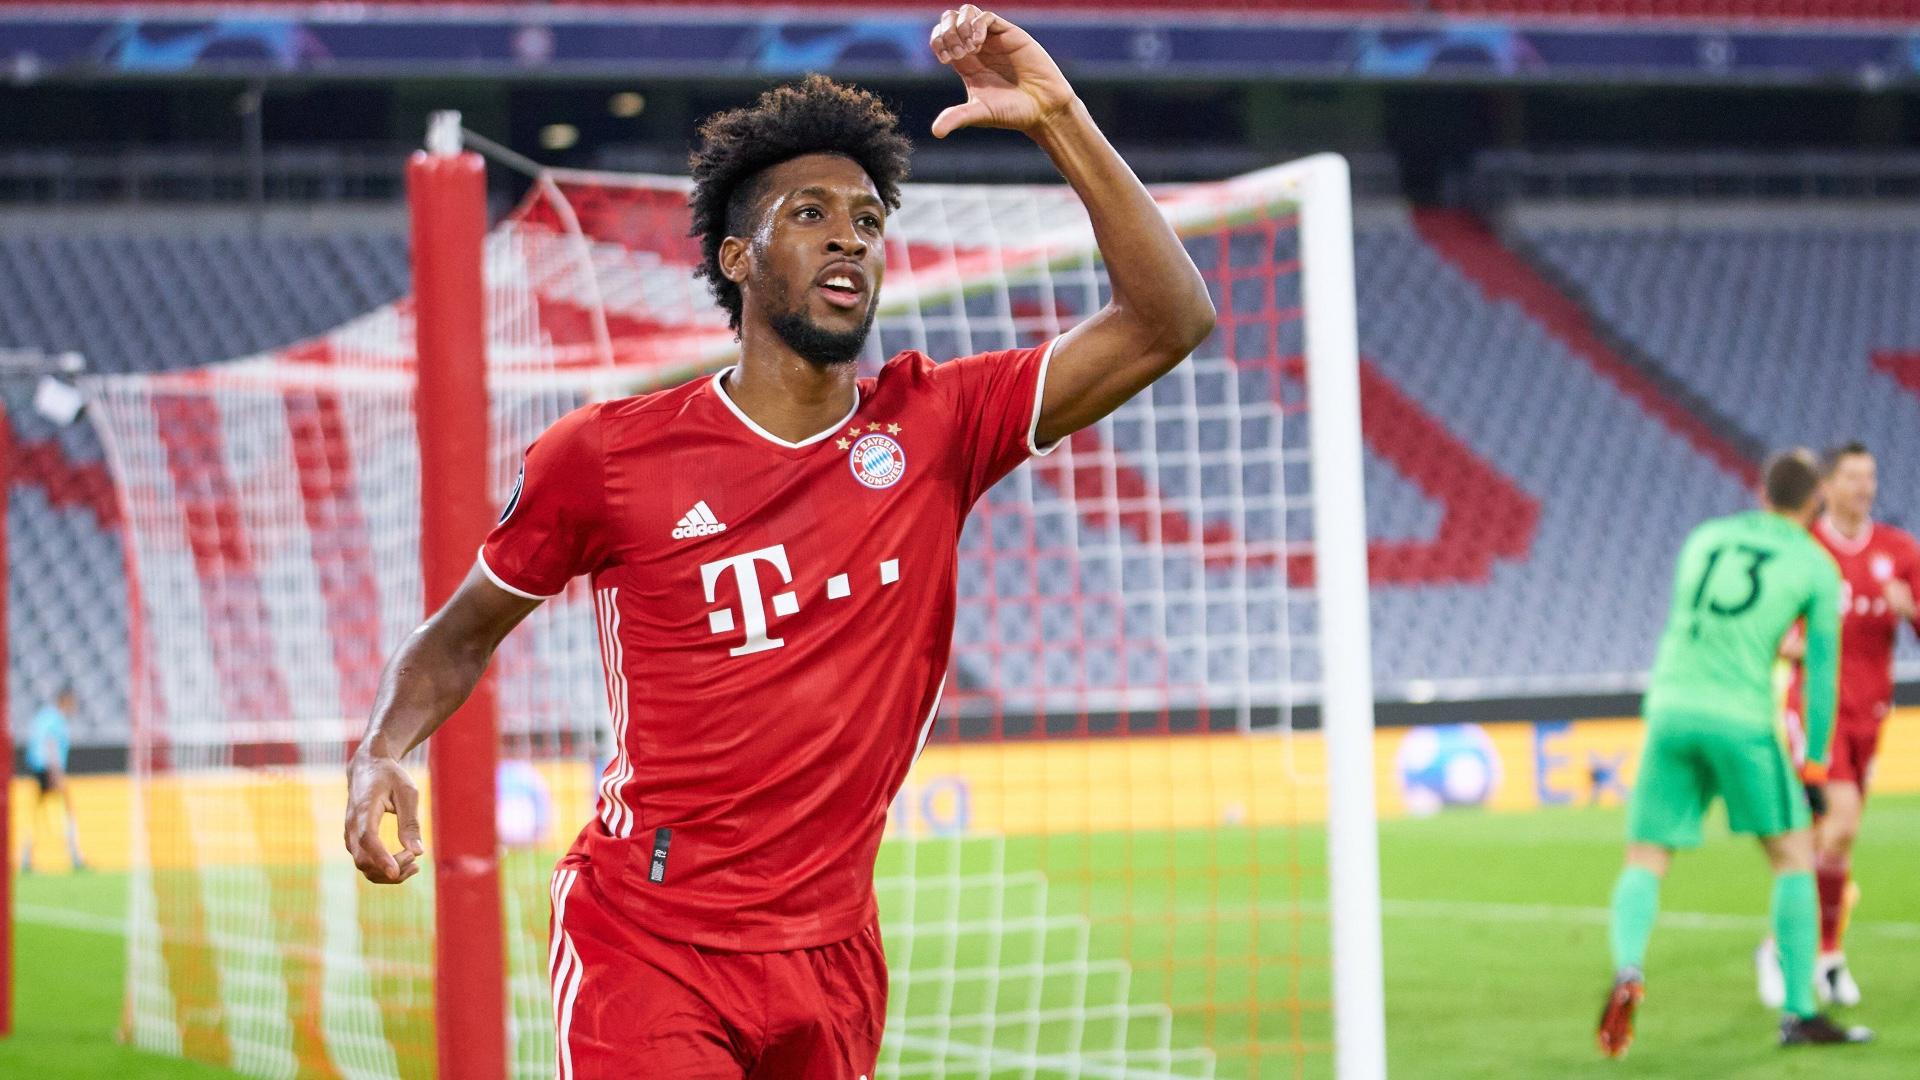 Match Report: Bayern Munchen 4-0 Atletico Madrid - World Today News